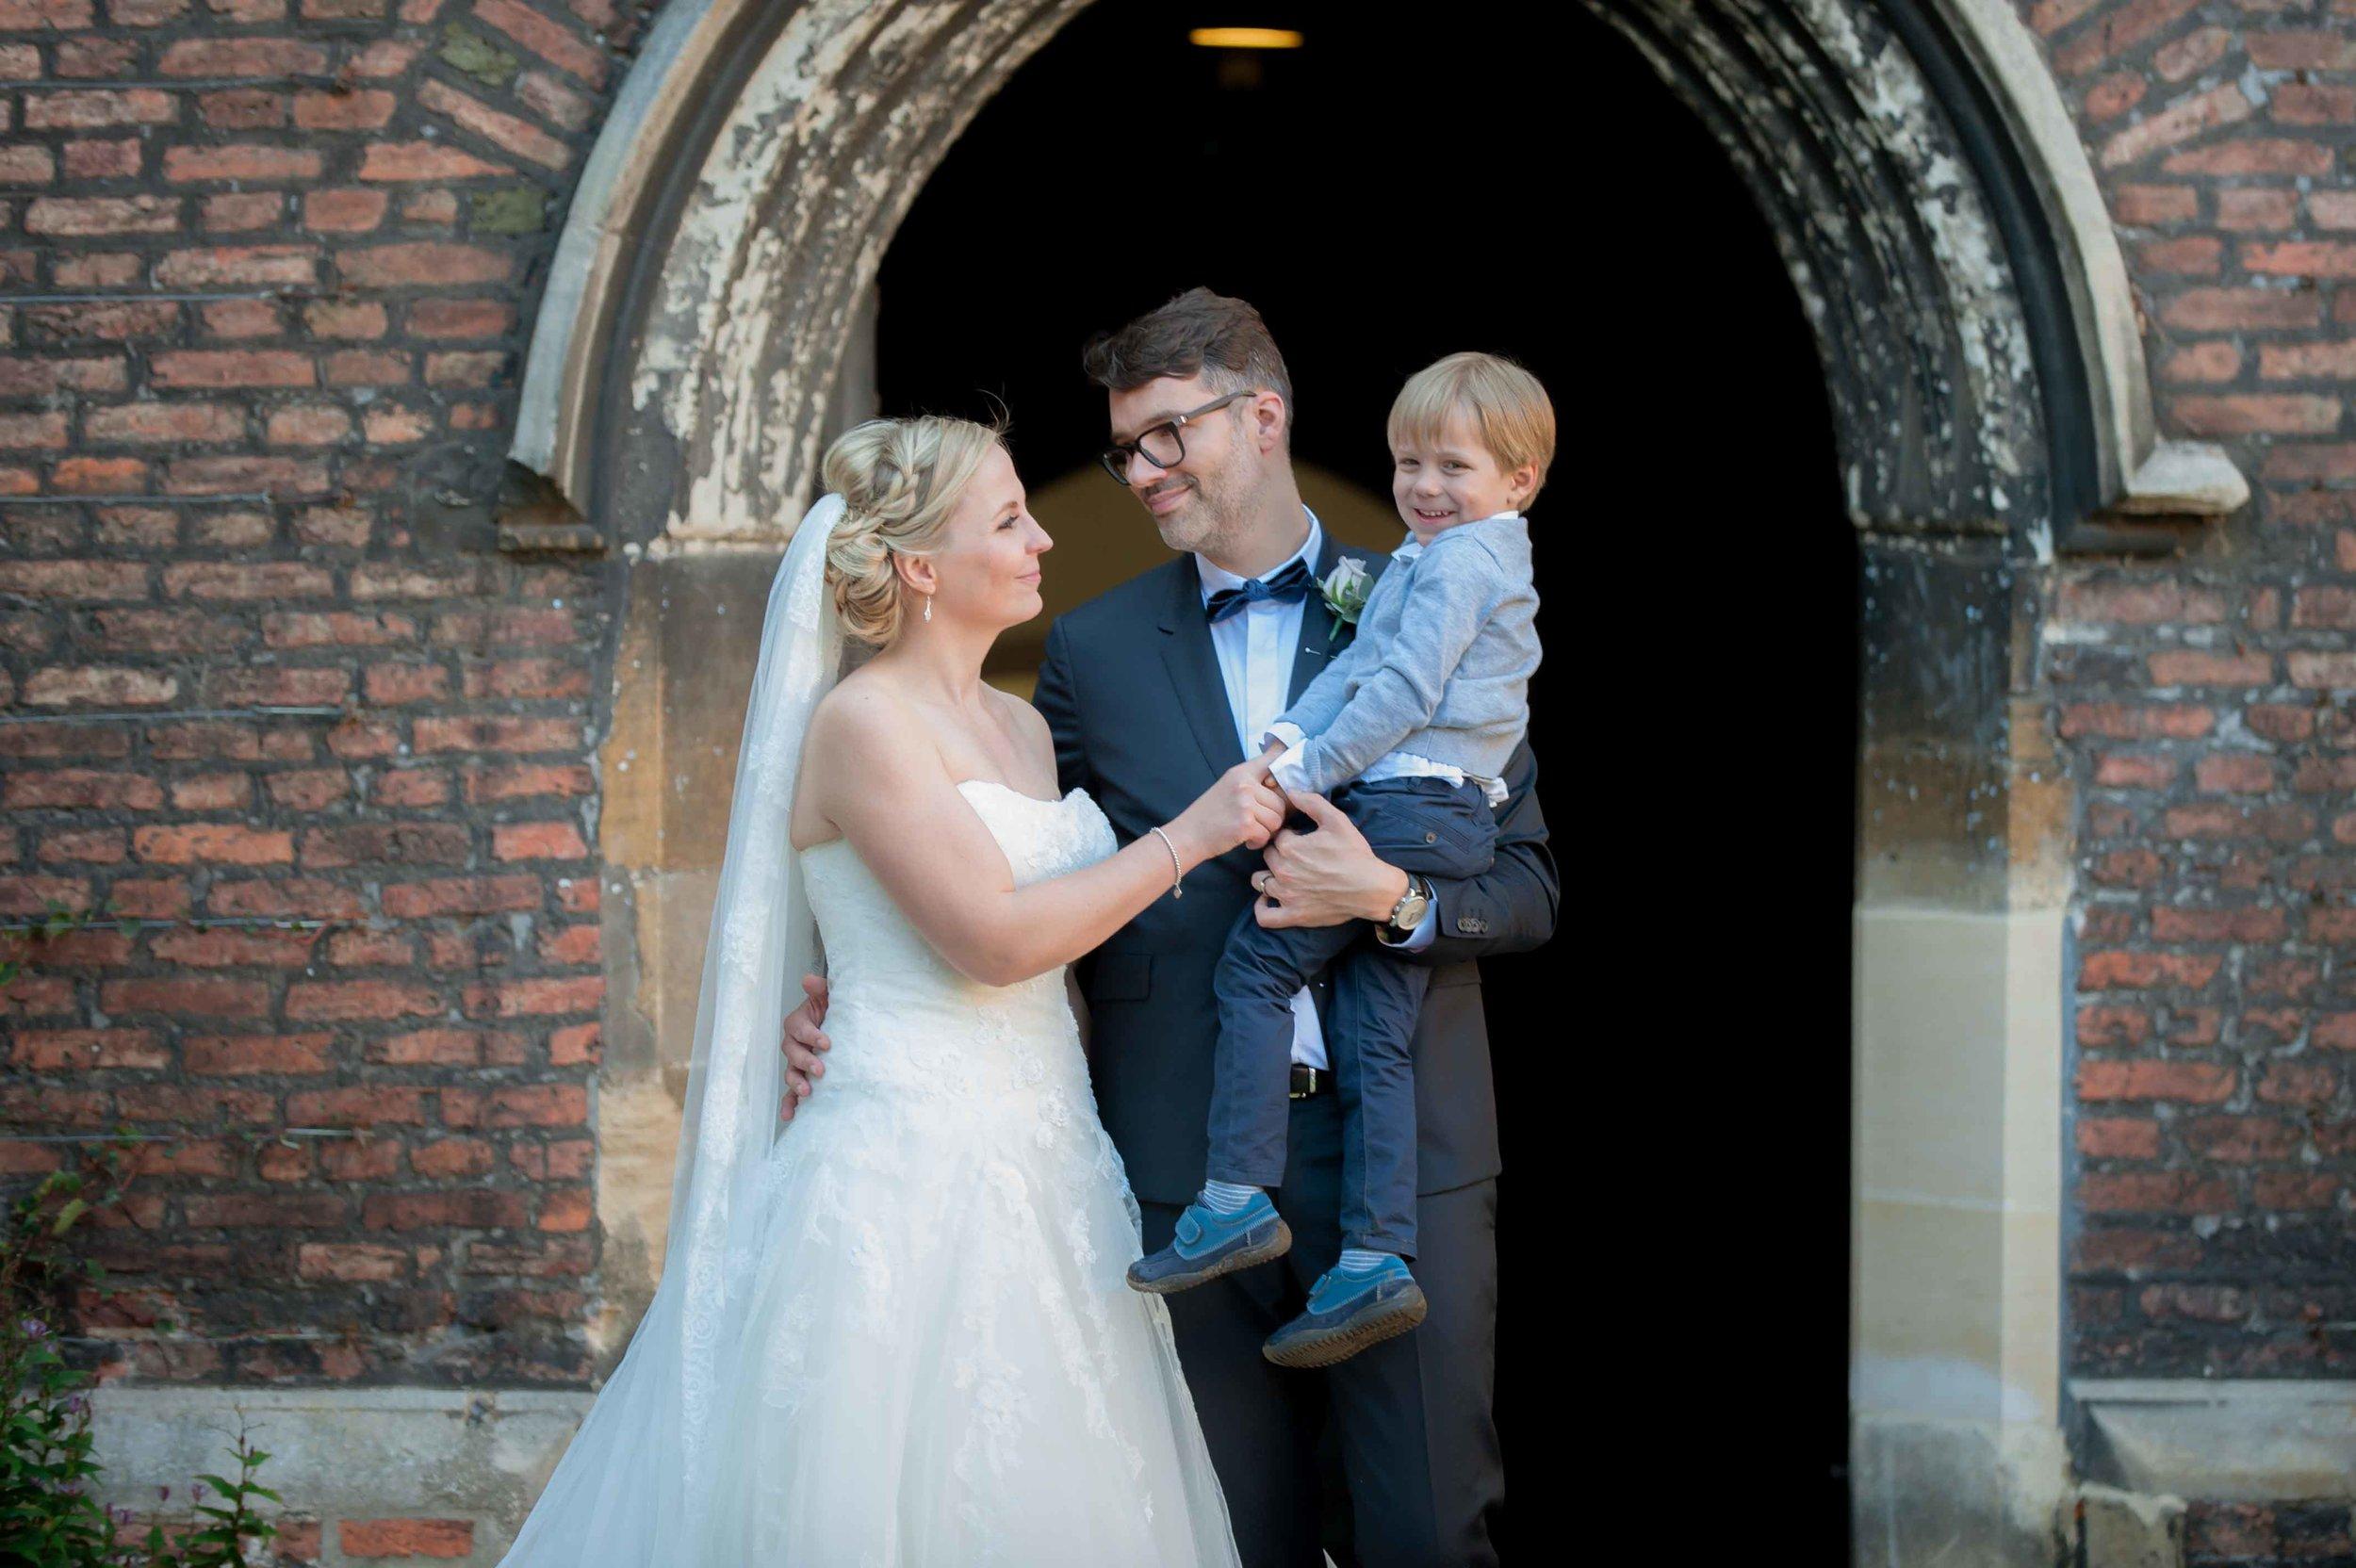 Adrian_Nicole_Charnwood_Weddings_Queens_College_Cambridge-1040.jpg